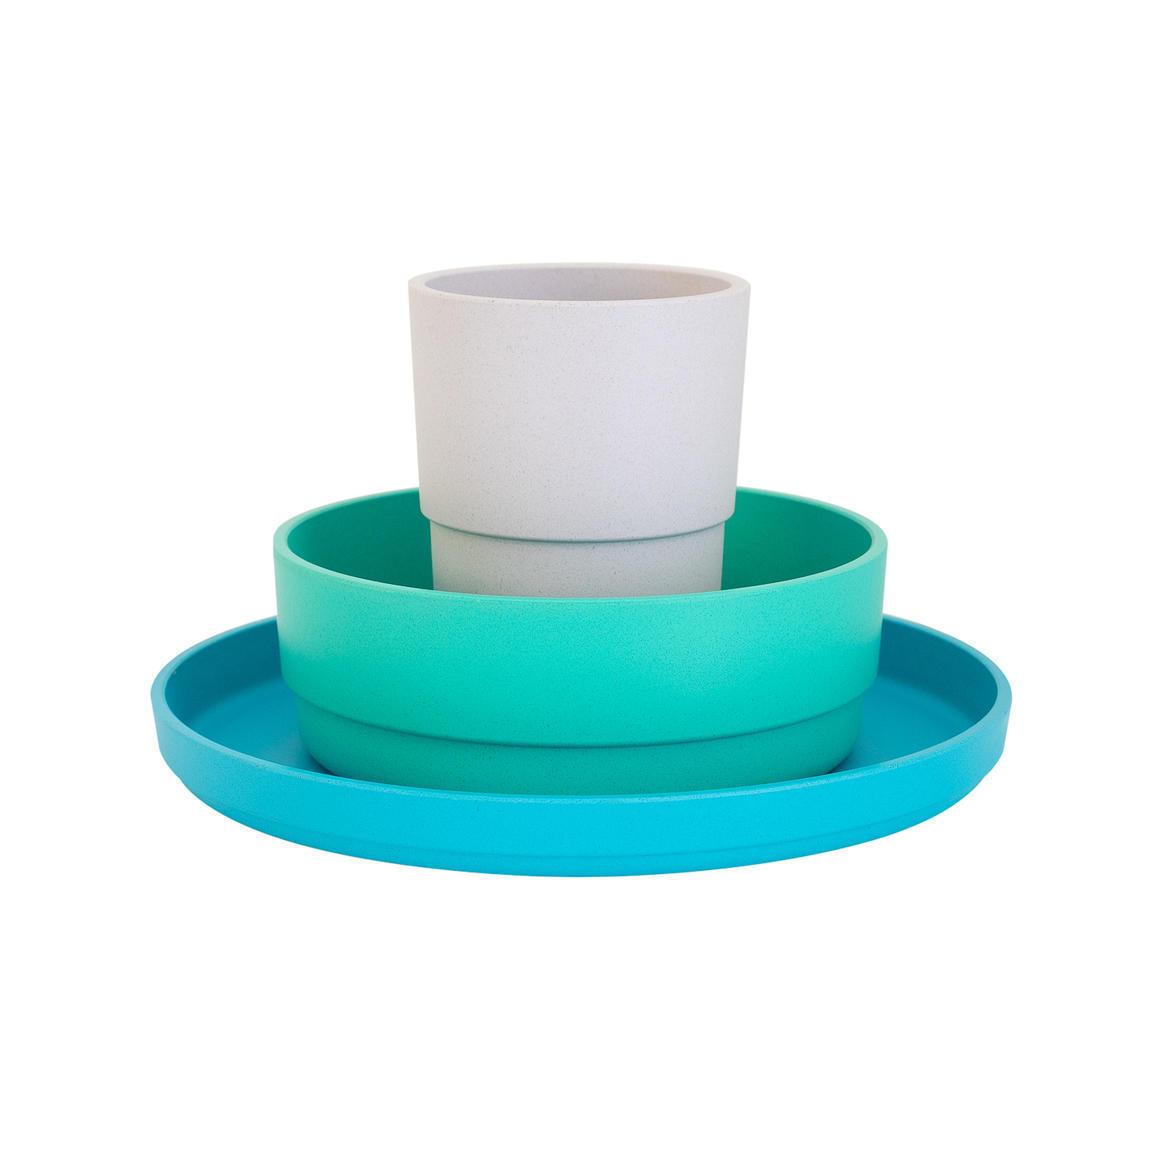 Plant-Based Dinnerware Set - Lagoon   Trada Marketplace